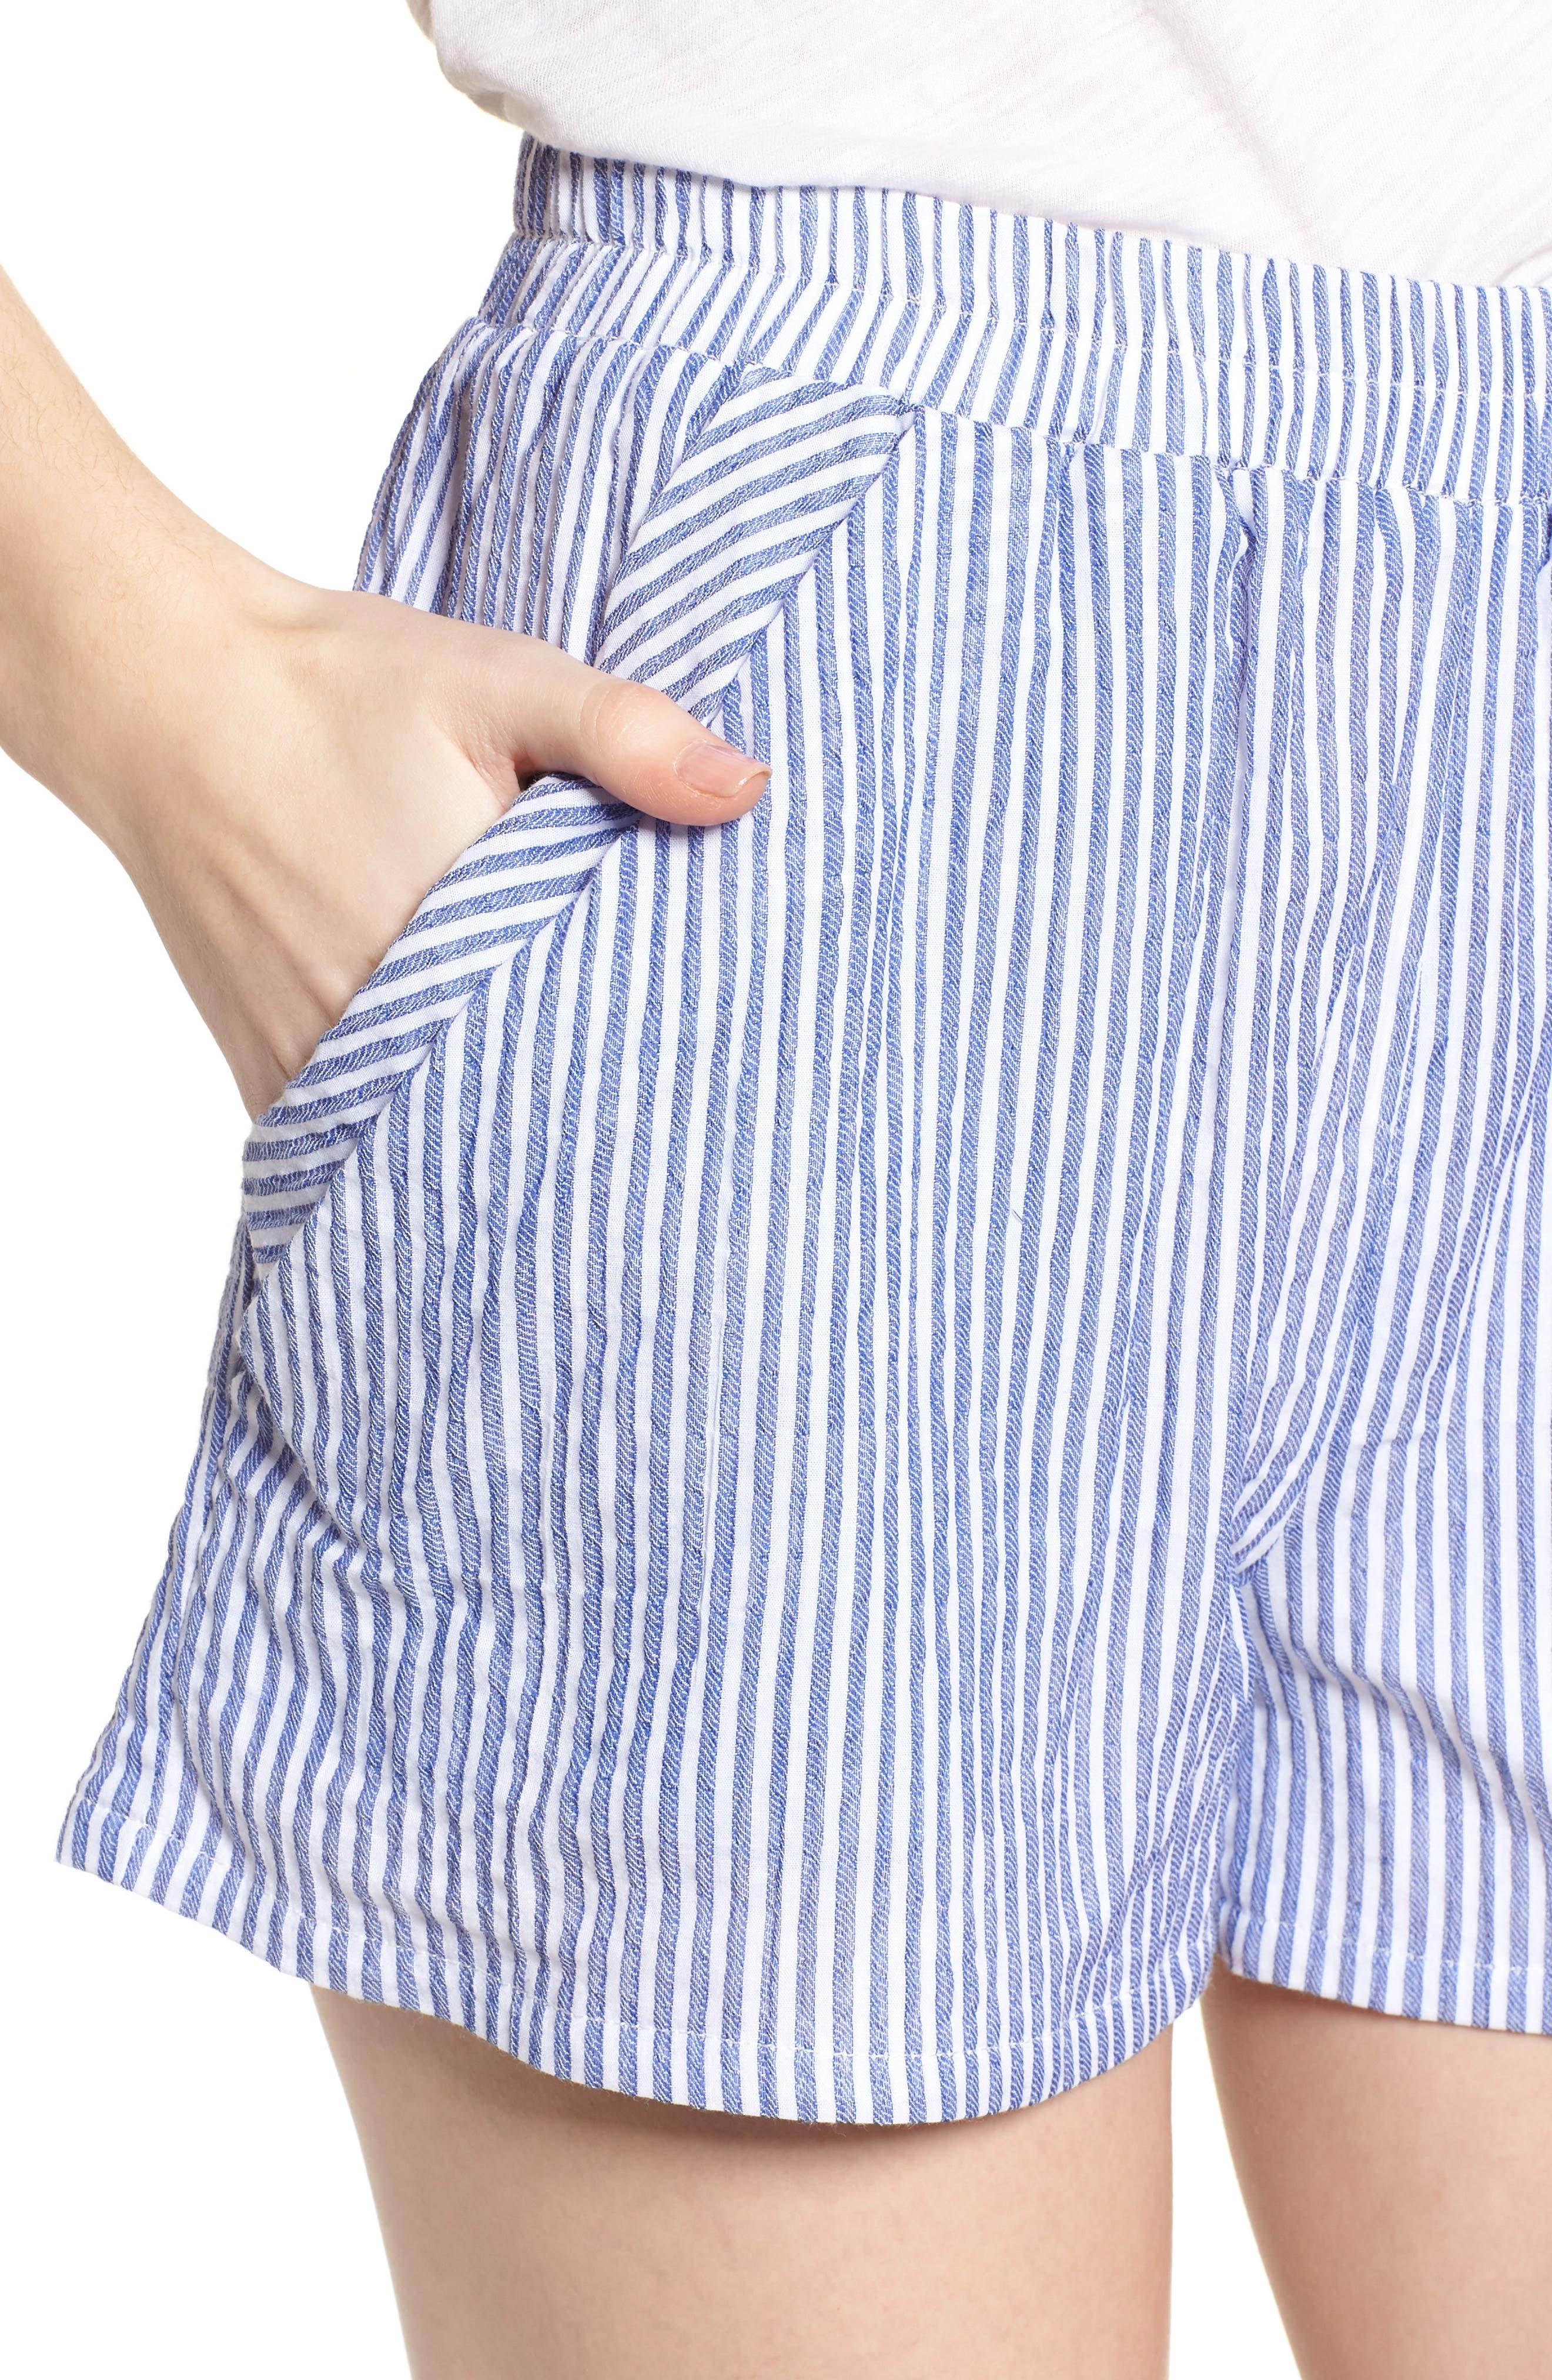 BISHOP + YOUNG,                             Stripe Shorts,                             Alternate thumbnail 4, color,                             400